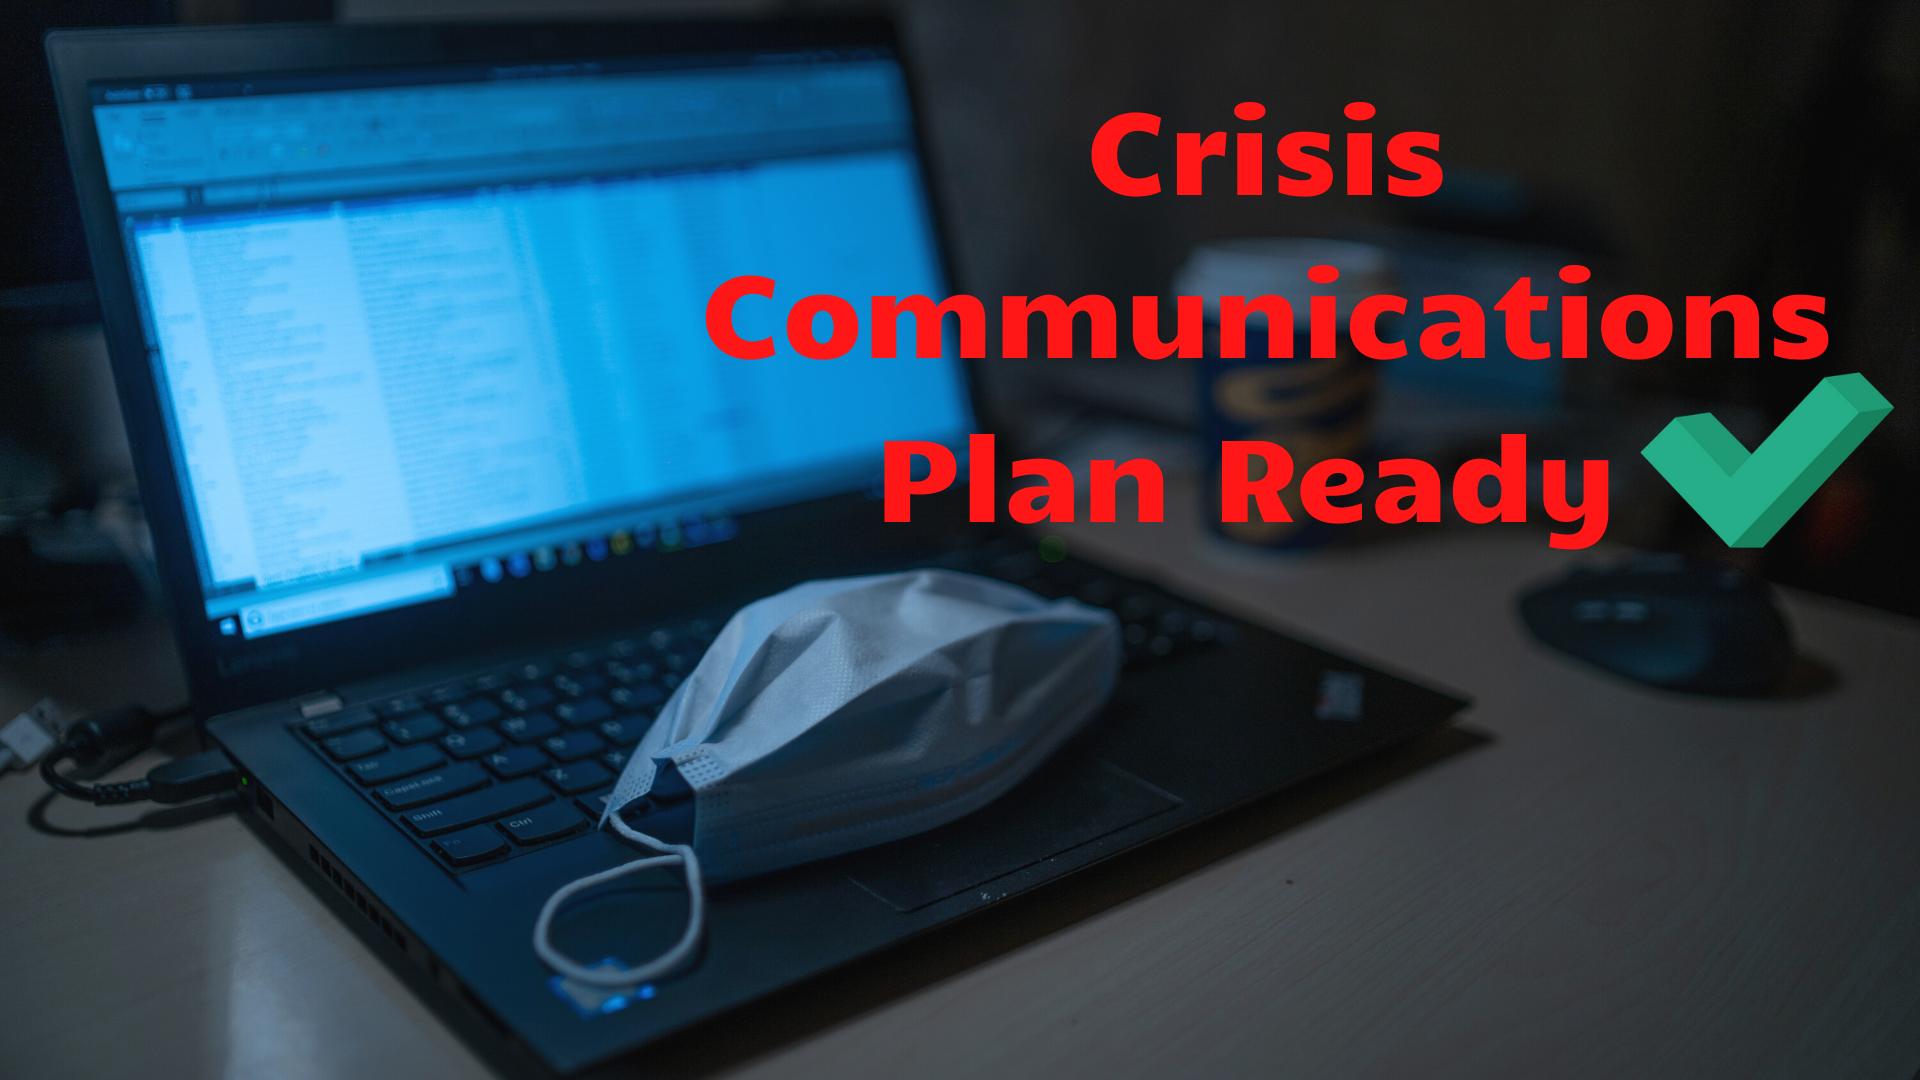 Crisis Communications Plan Ready